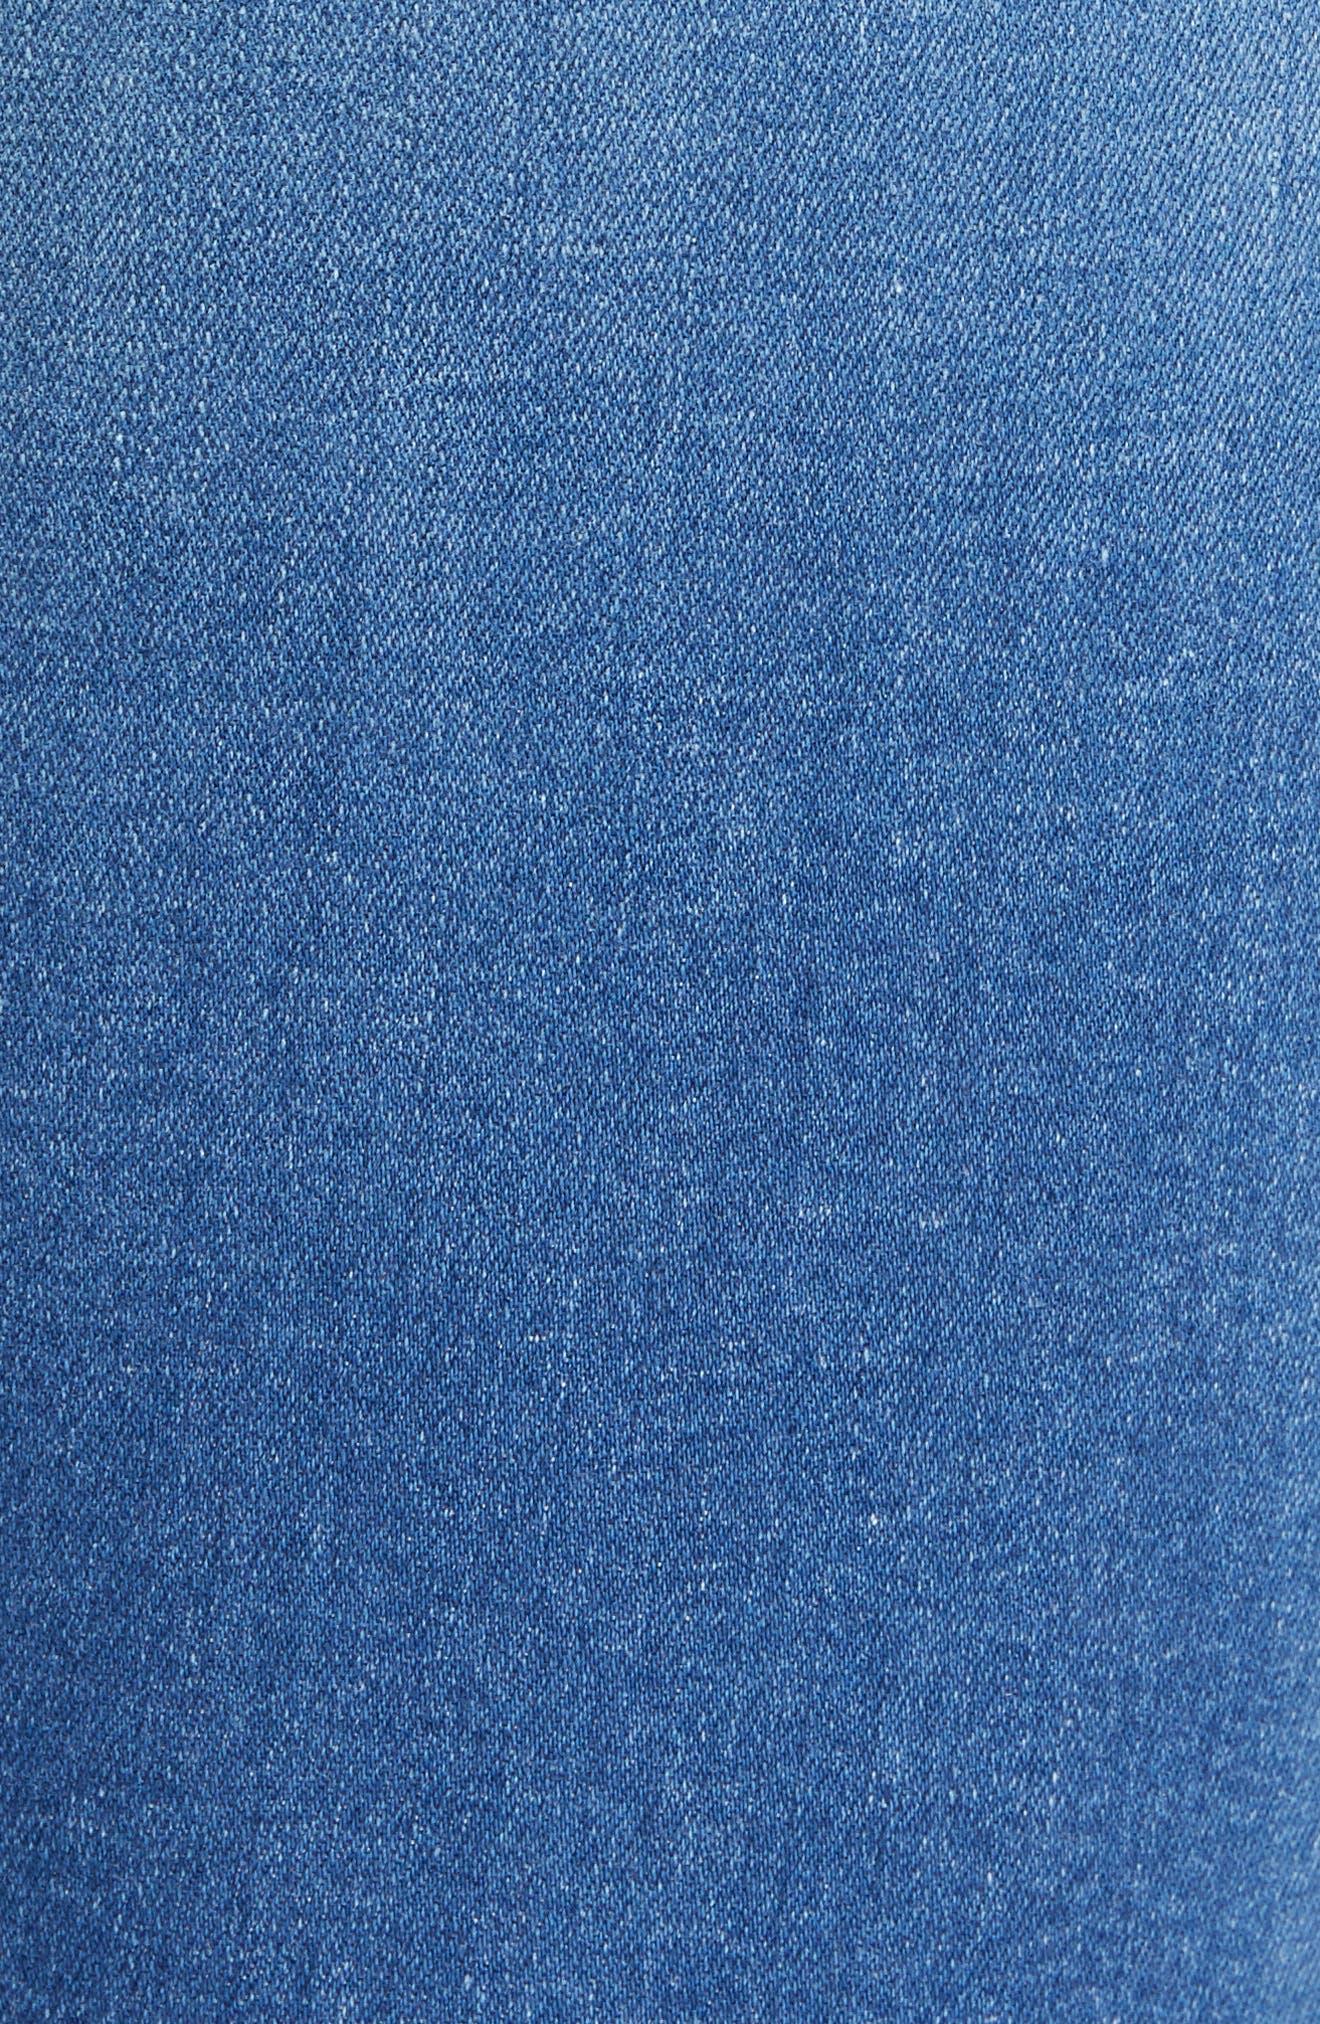 RAG & BONE, Cate High Waist Ankle Skinny Jeans, Alternate thumbnail 6, color, FLINT